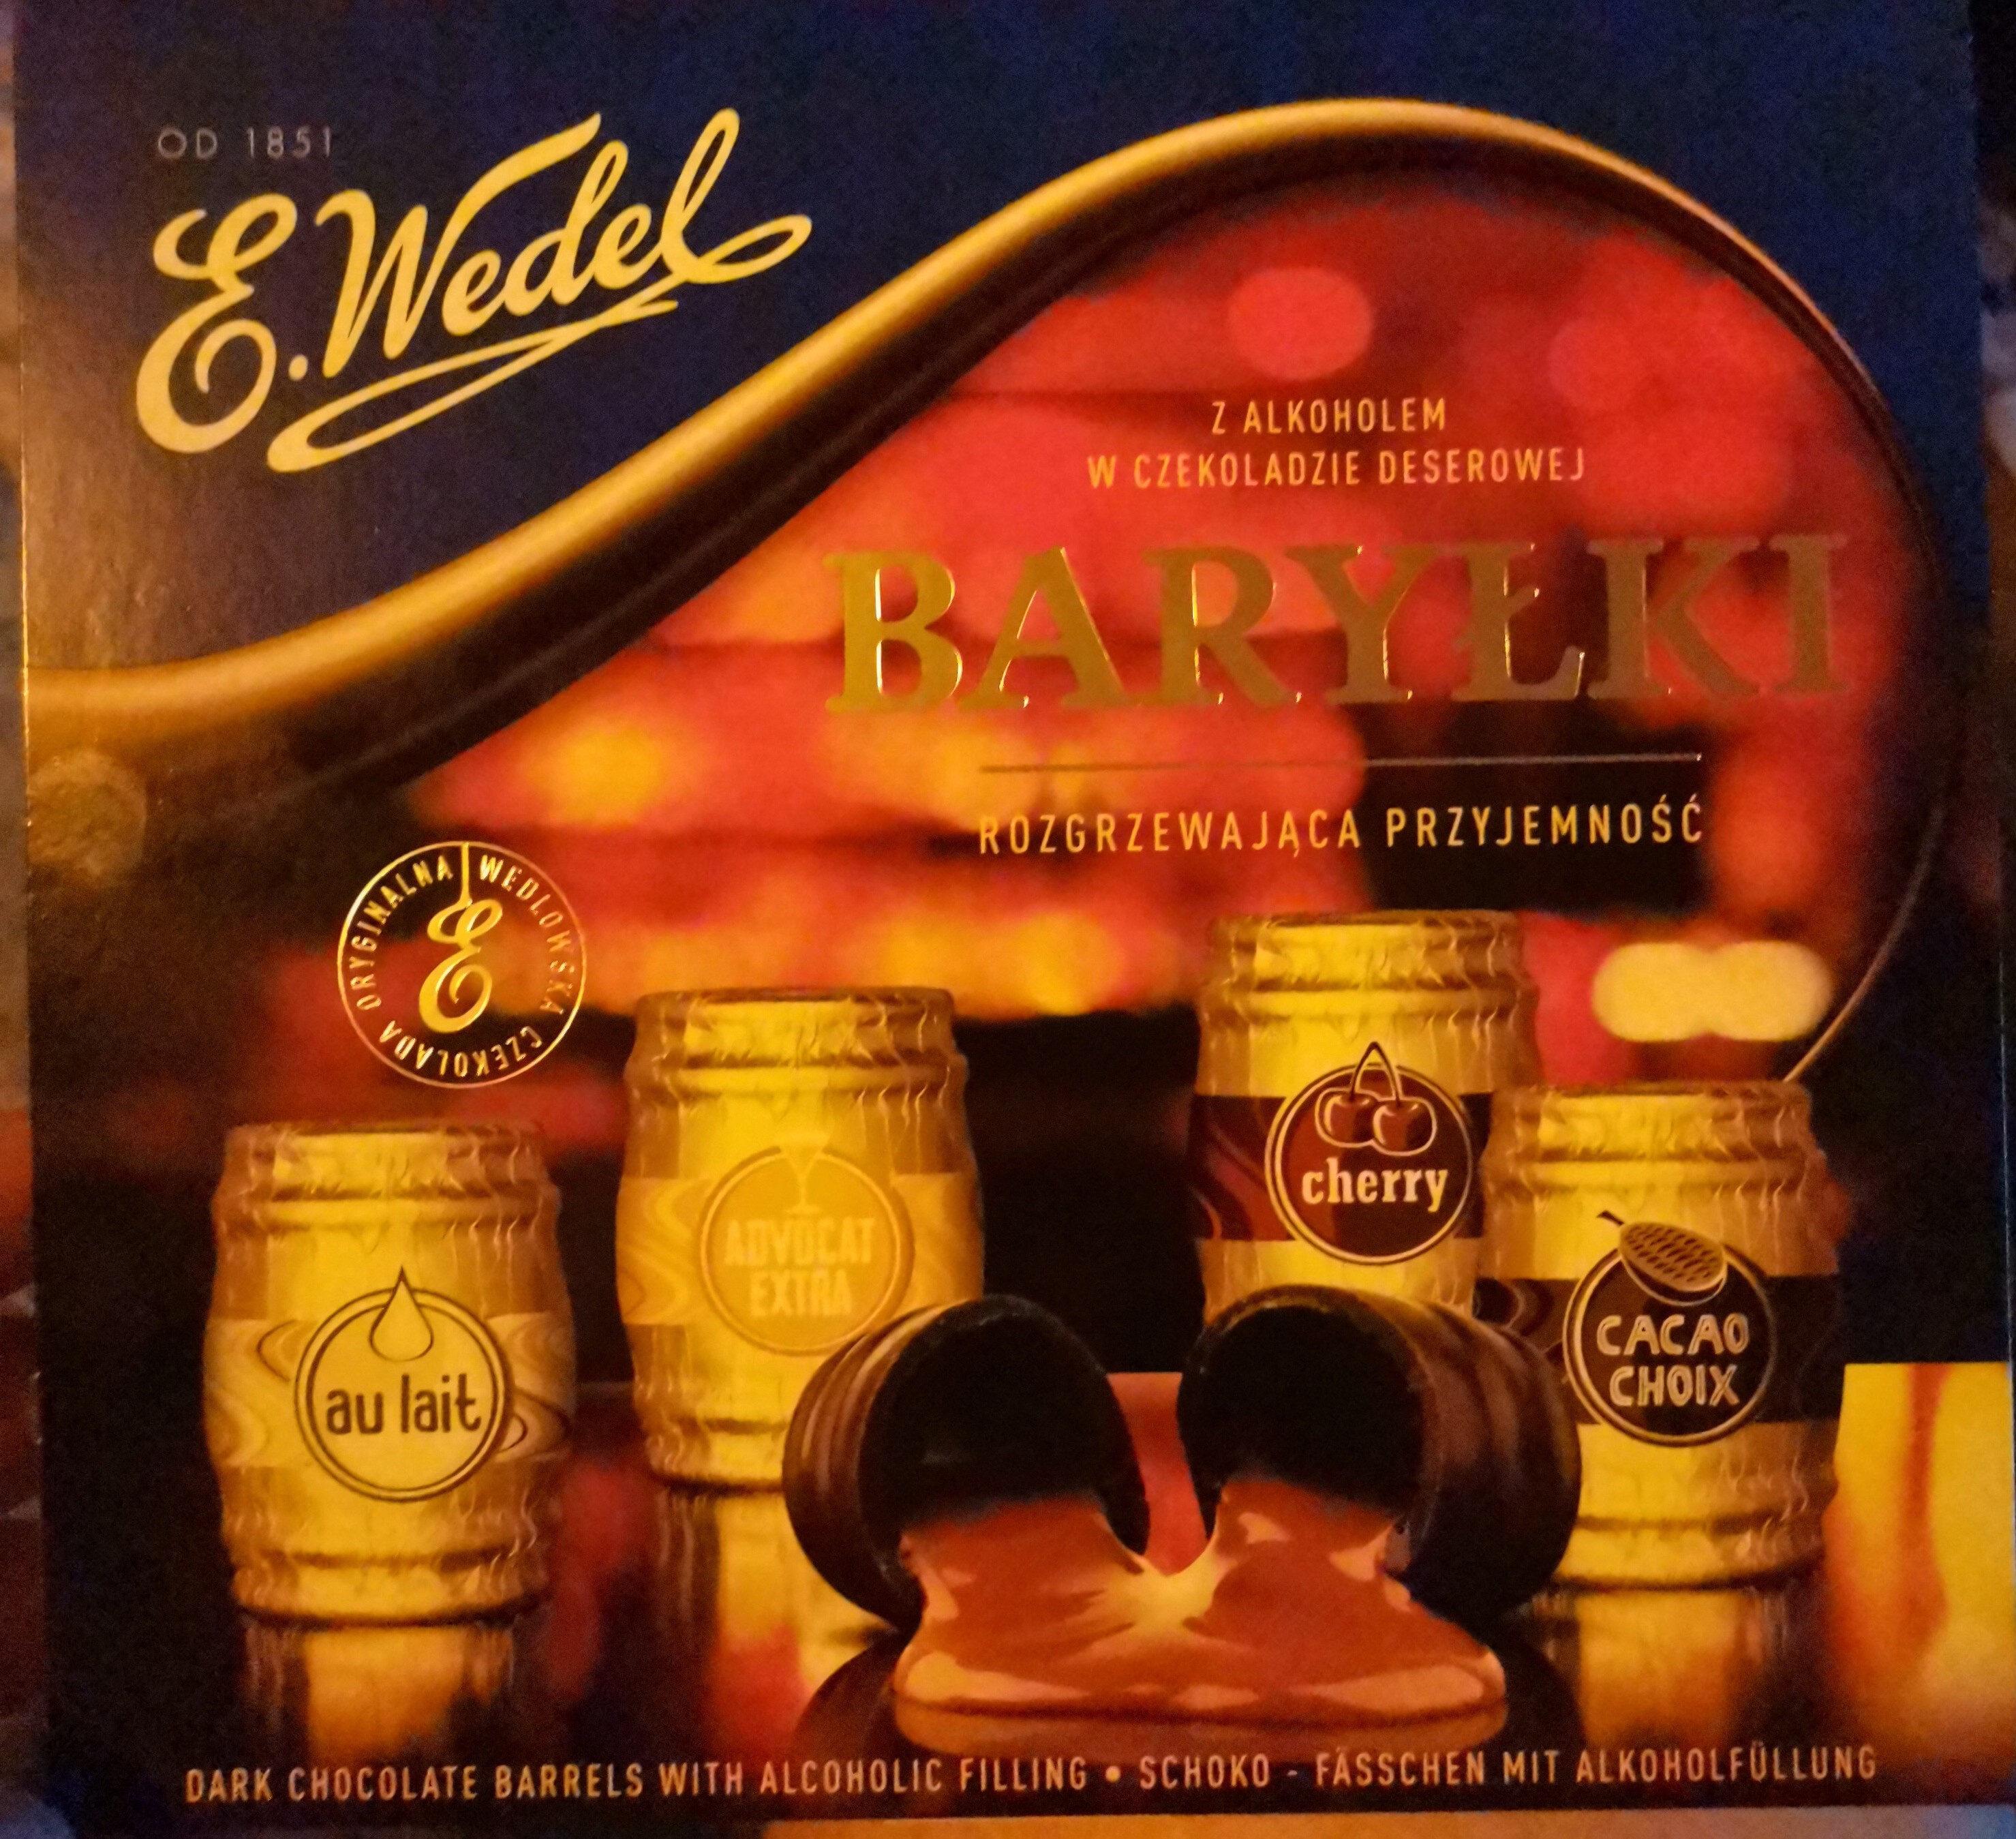 Czekoladki Wedel Baryłki - Produkt - fr